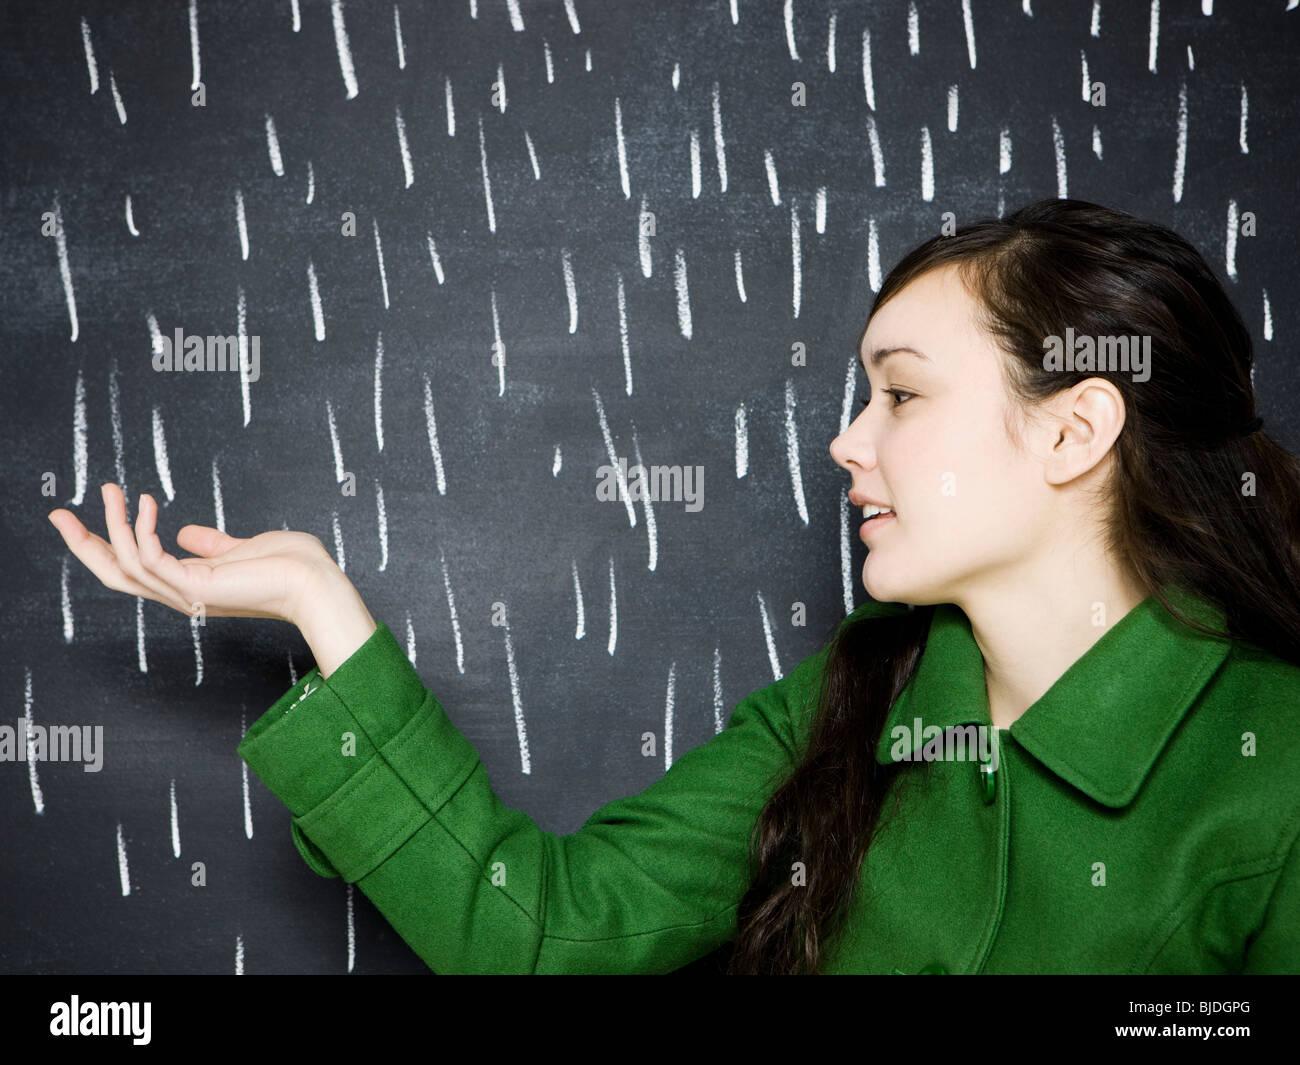 woman in a chalkboard rainstorm - Stock Image